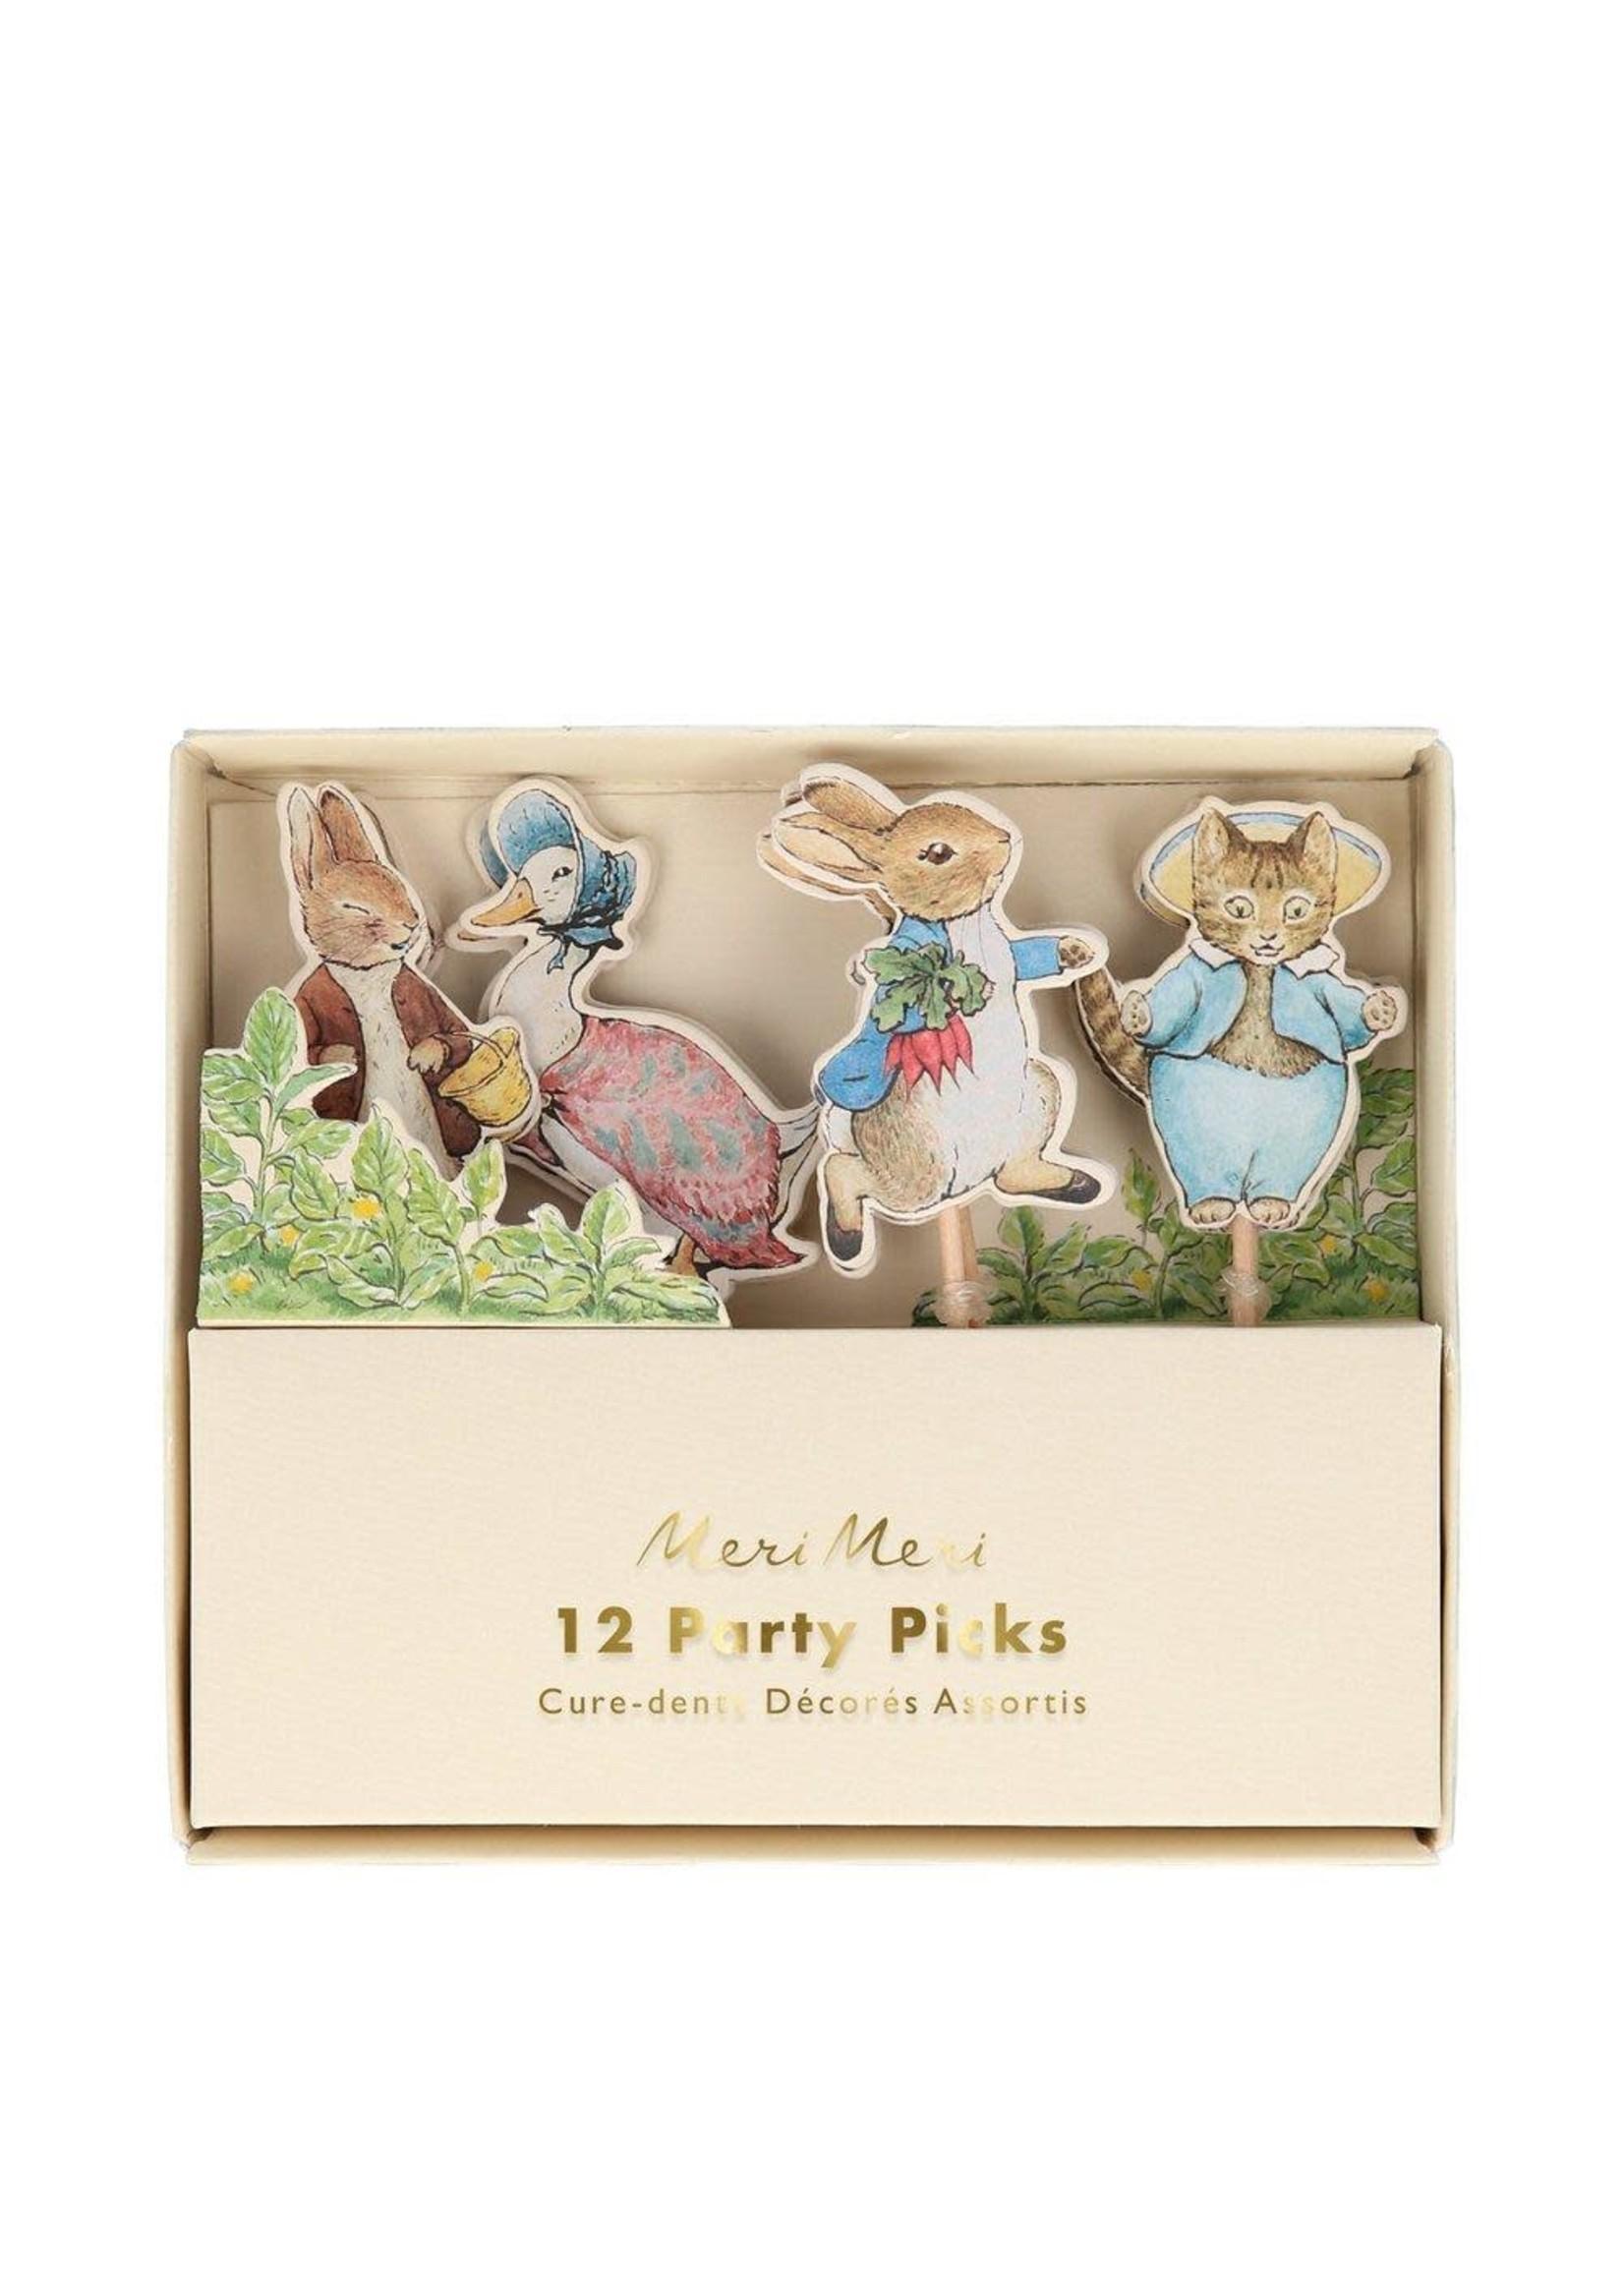 Meri Meri Peter Rabbit & Friends Party Picks